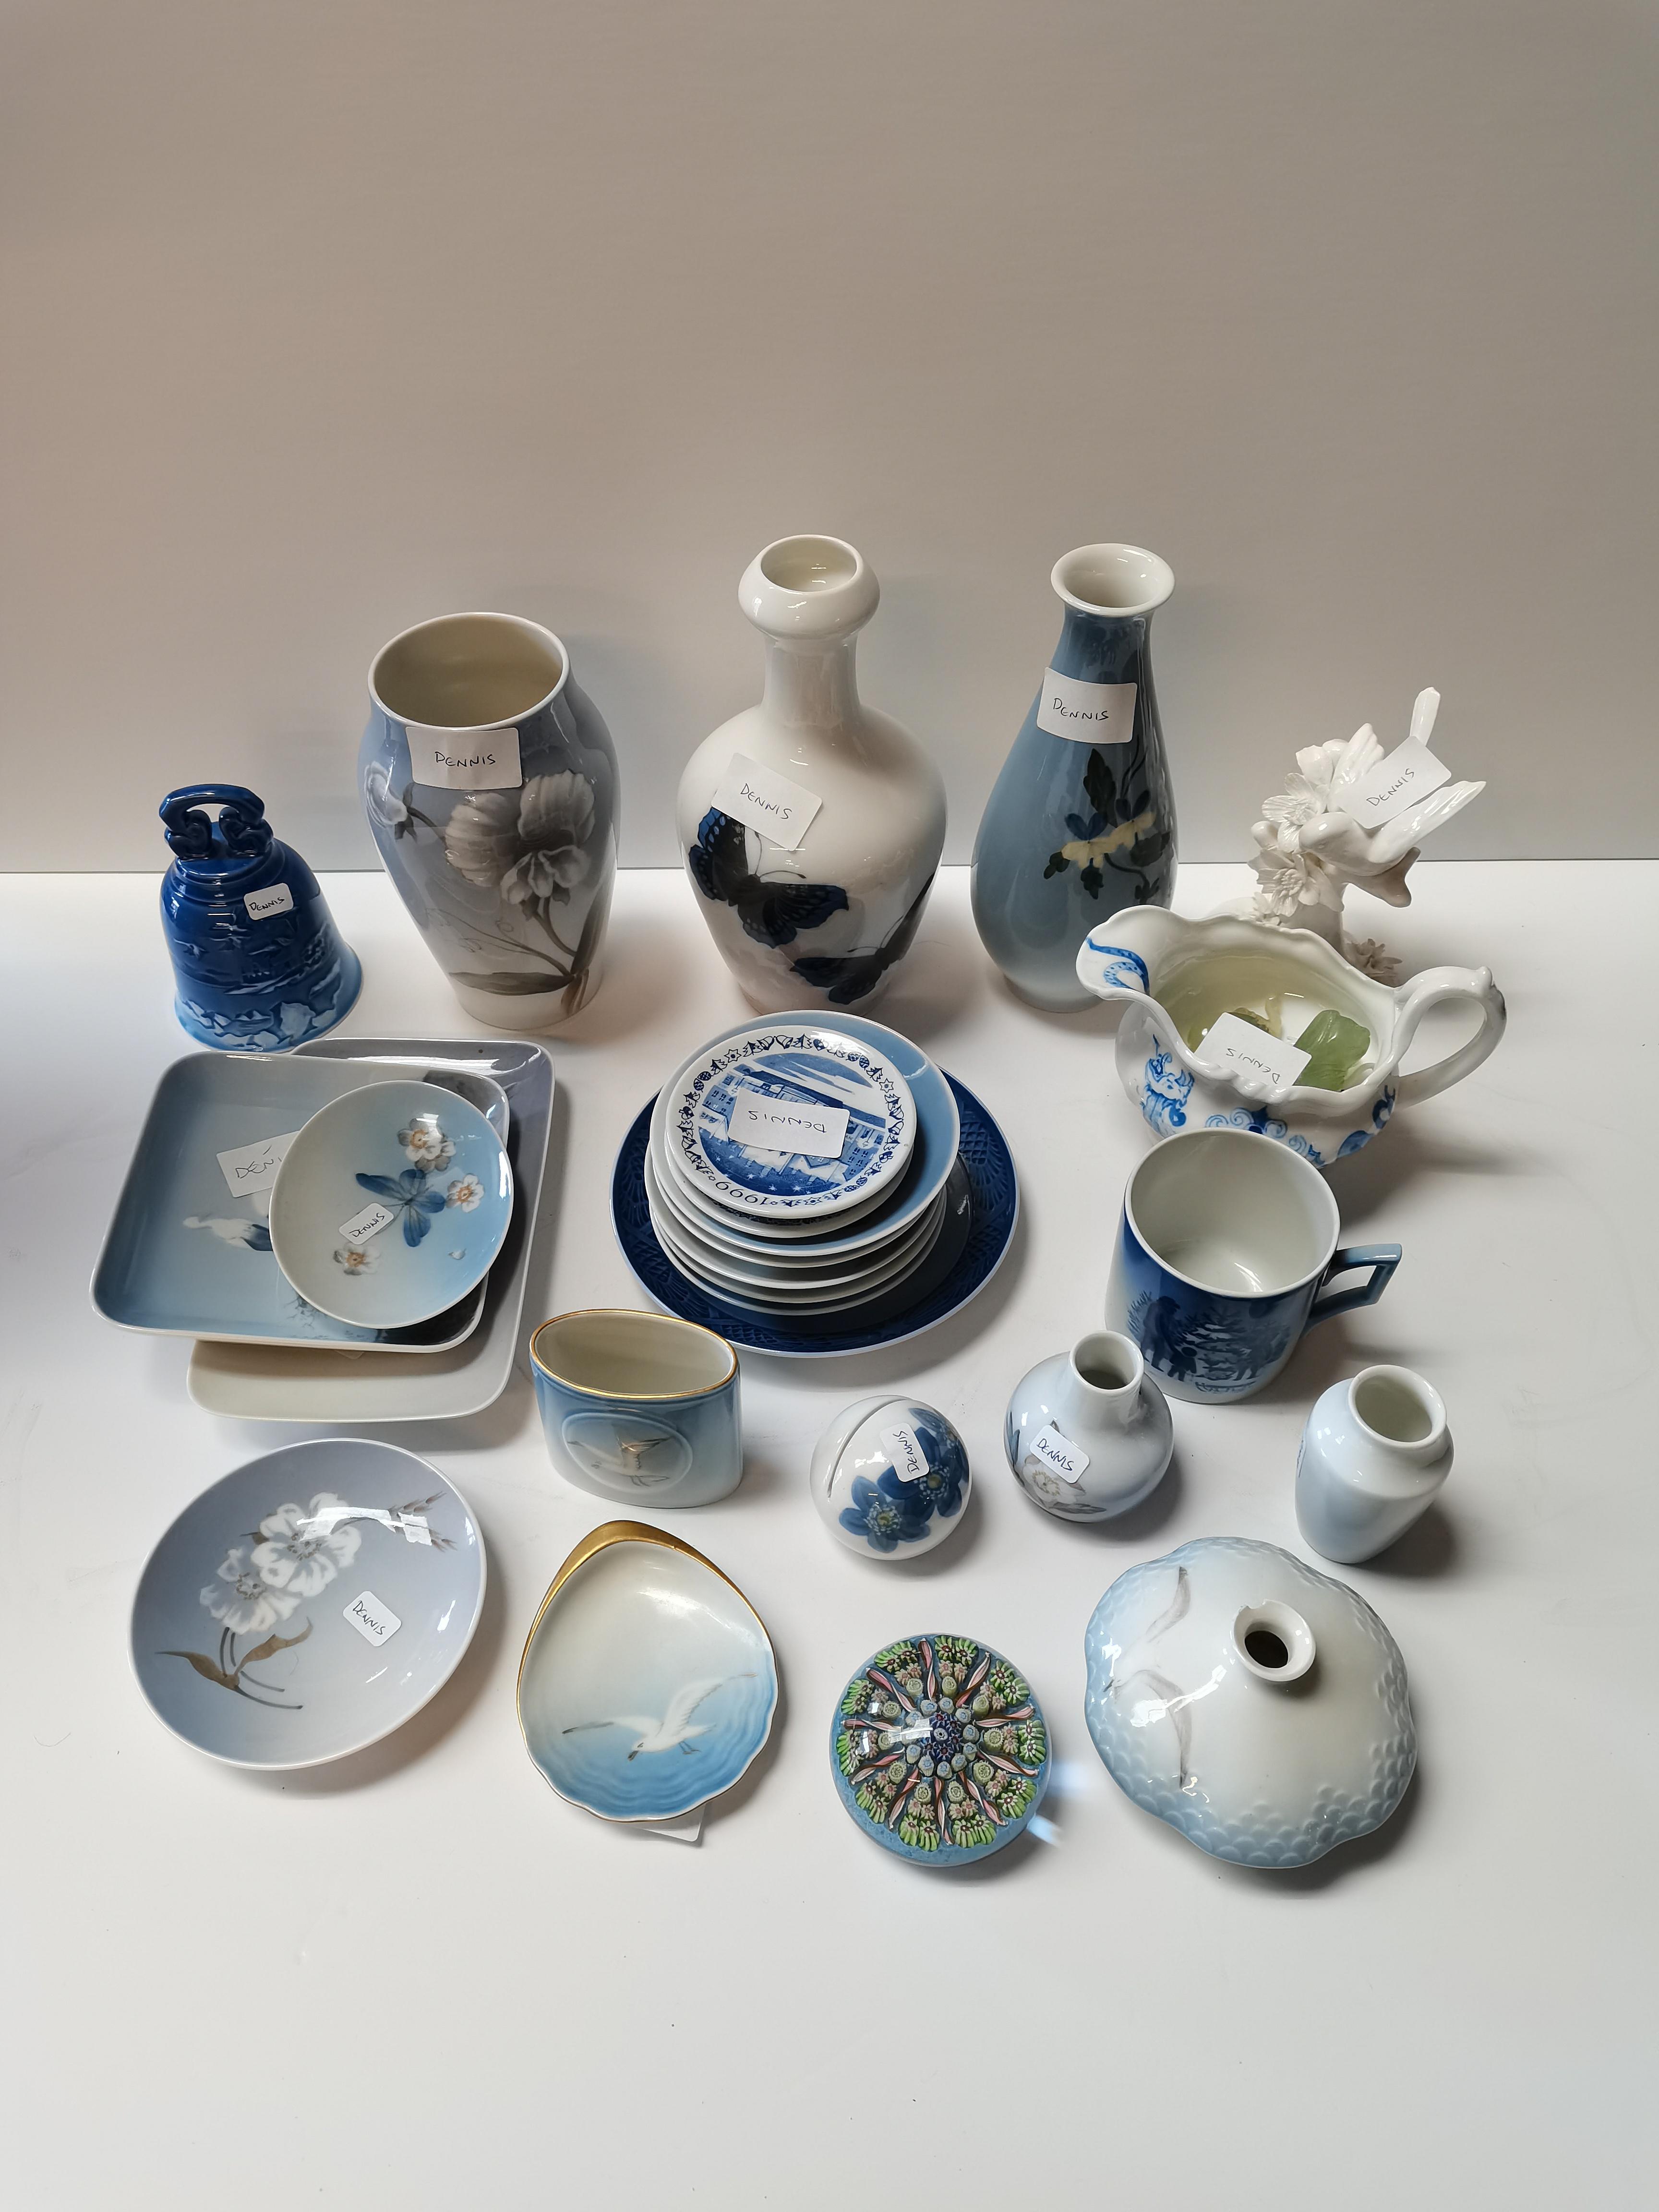 Collection of Royal copenhagen items